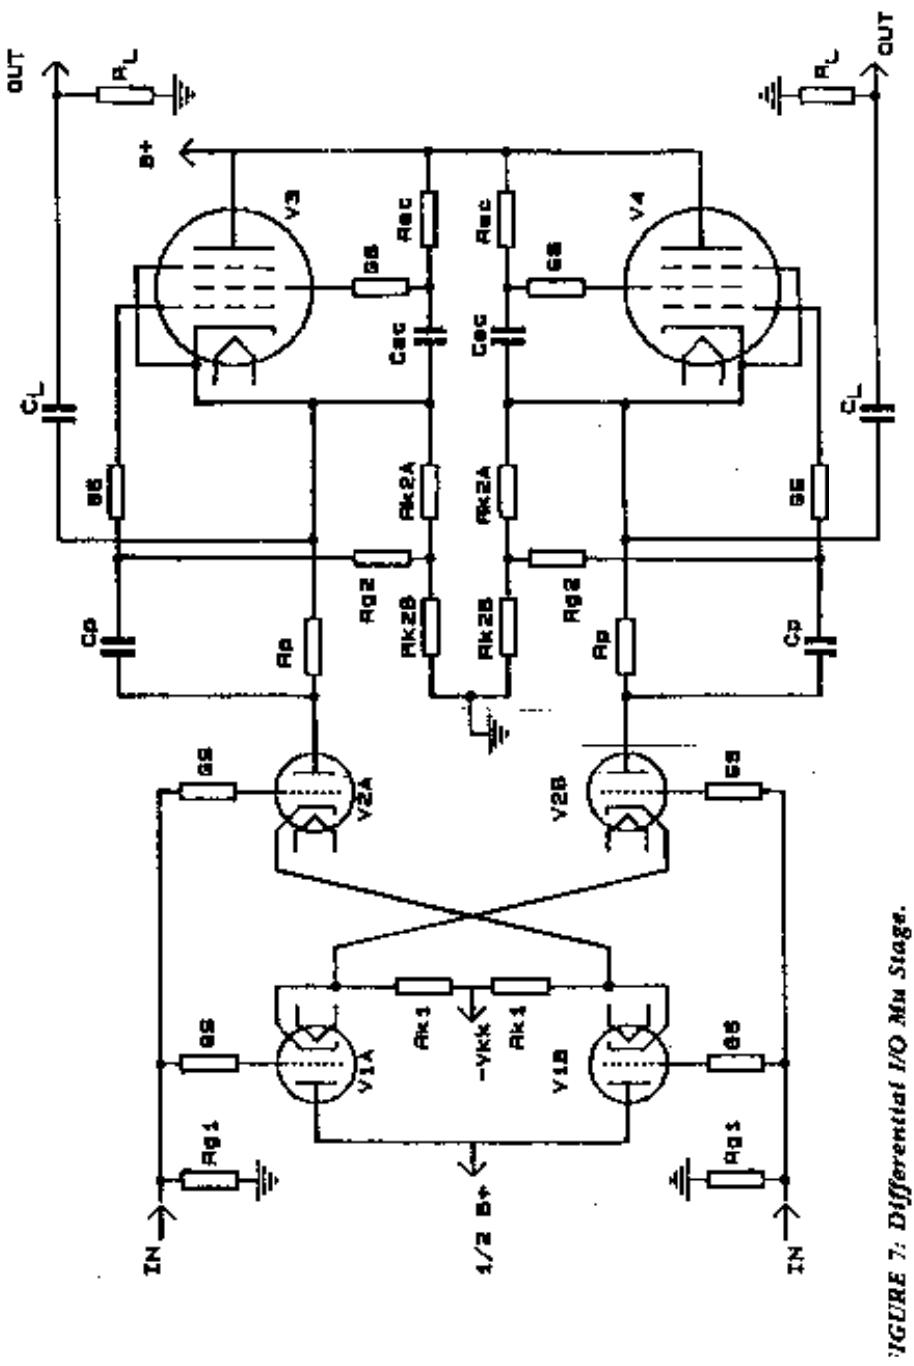 Snap Diy High End Audio Amplifier Schematics Do It Your Self Photos 30 Watt Stereo Circuit Gadgetronicx Hiend Hi Fi Electronics Site For Lovers